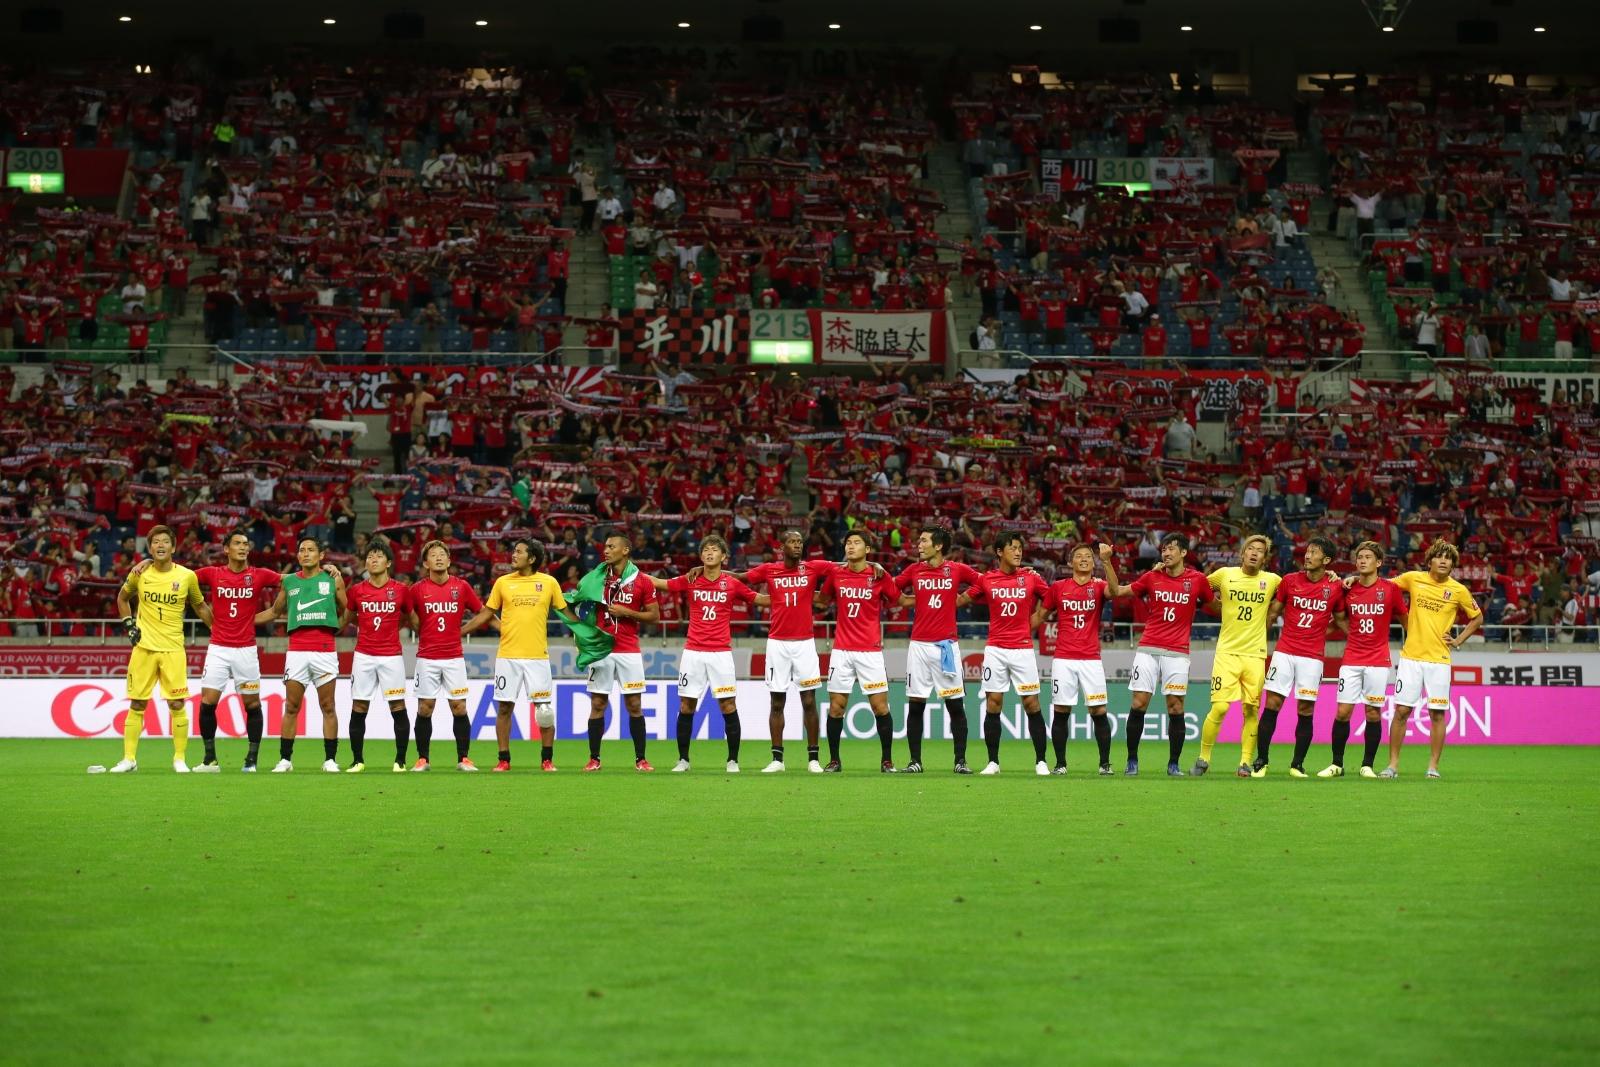 The Urawa Red Diamonds on the field.